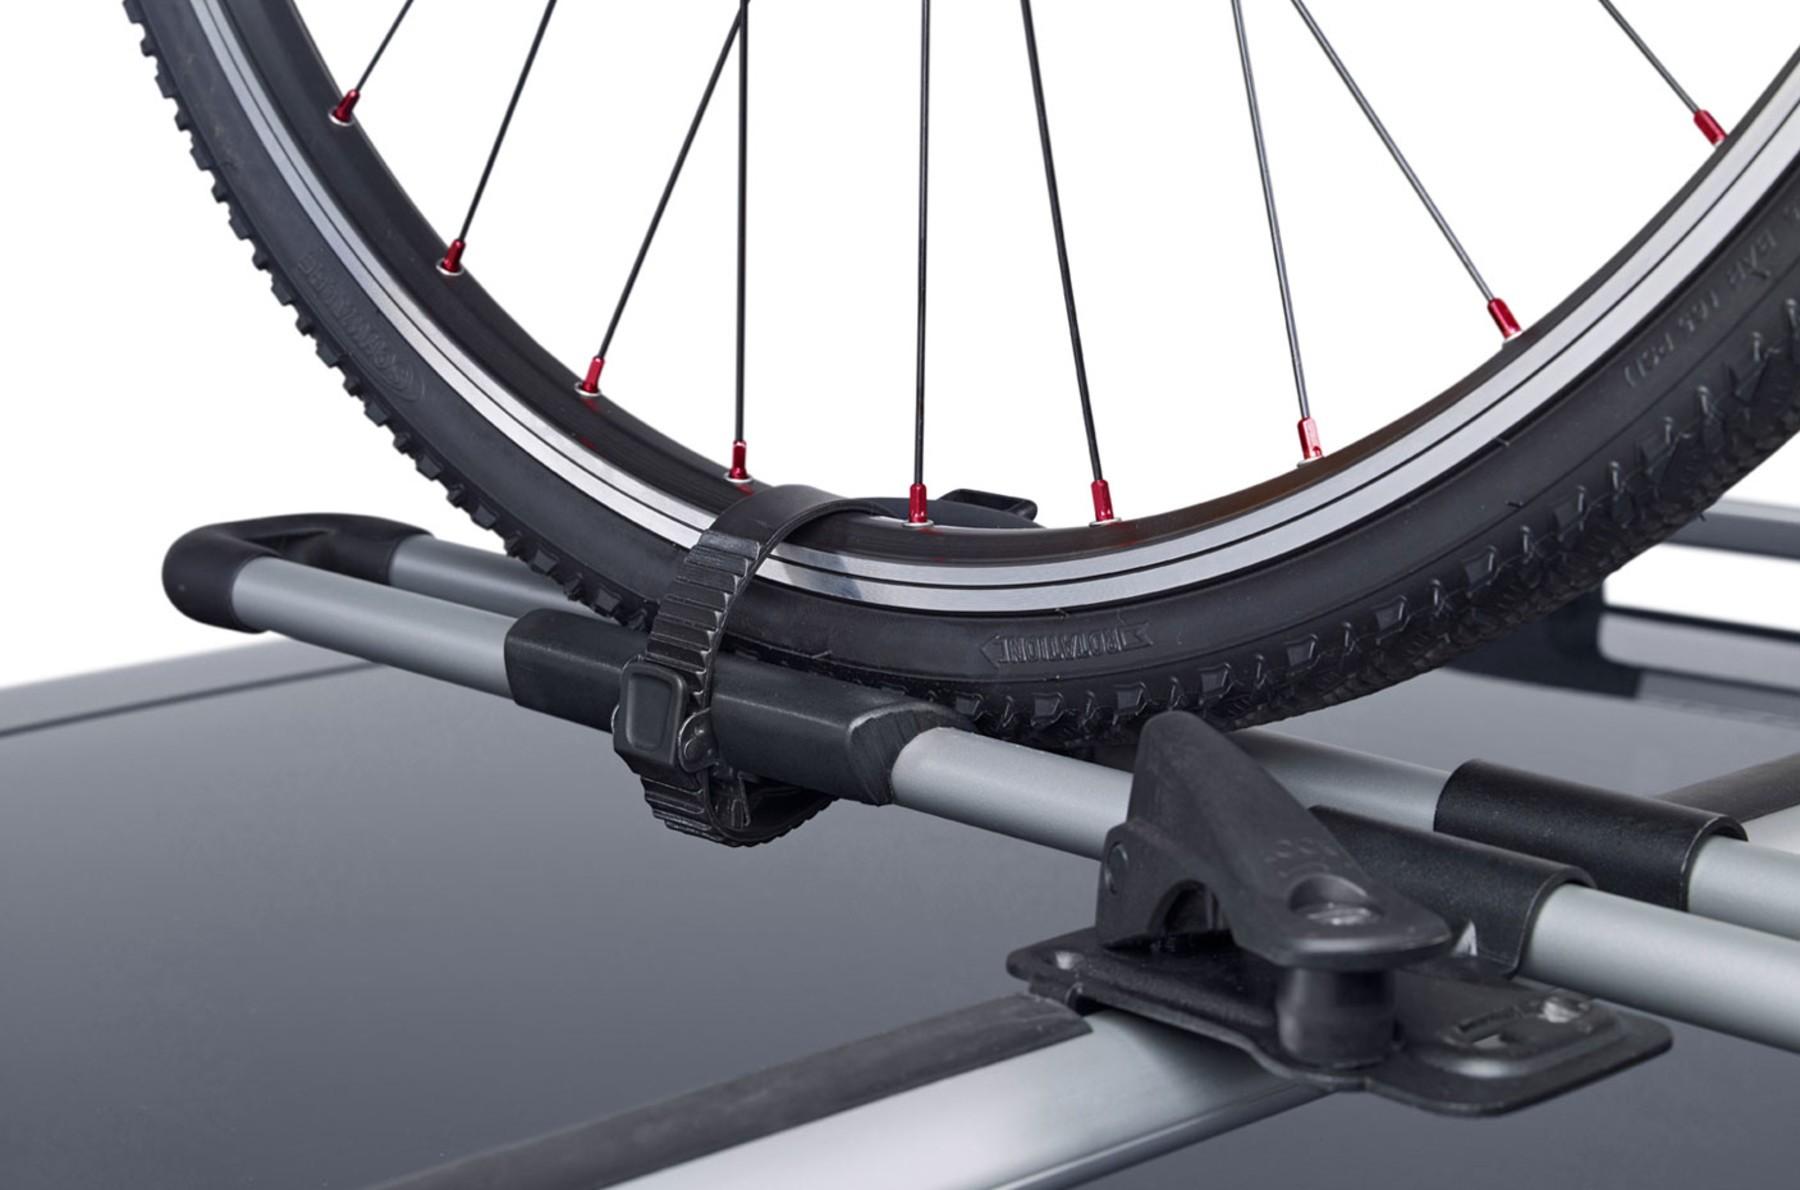 Suporte de Bicicleta Transbike de Teto 1 Bike Thule FreeRide 532